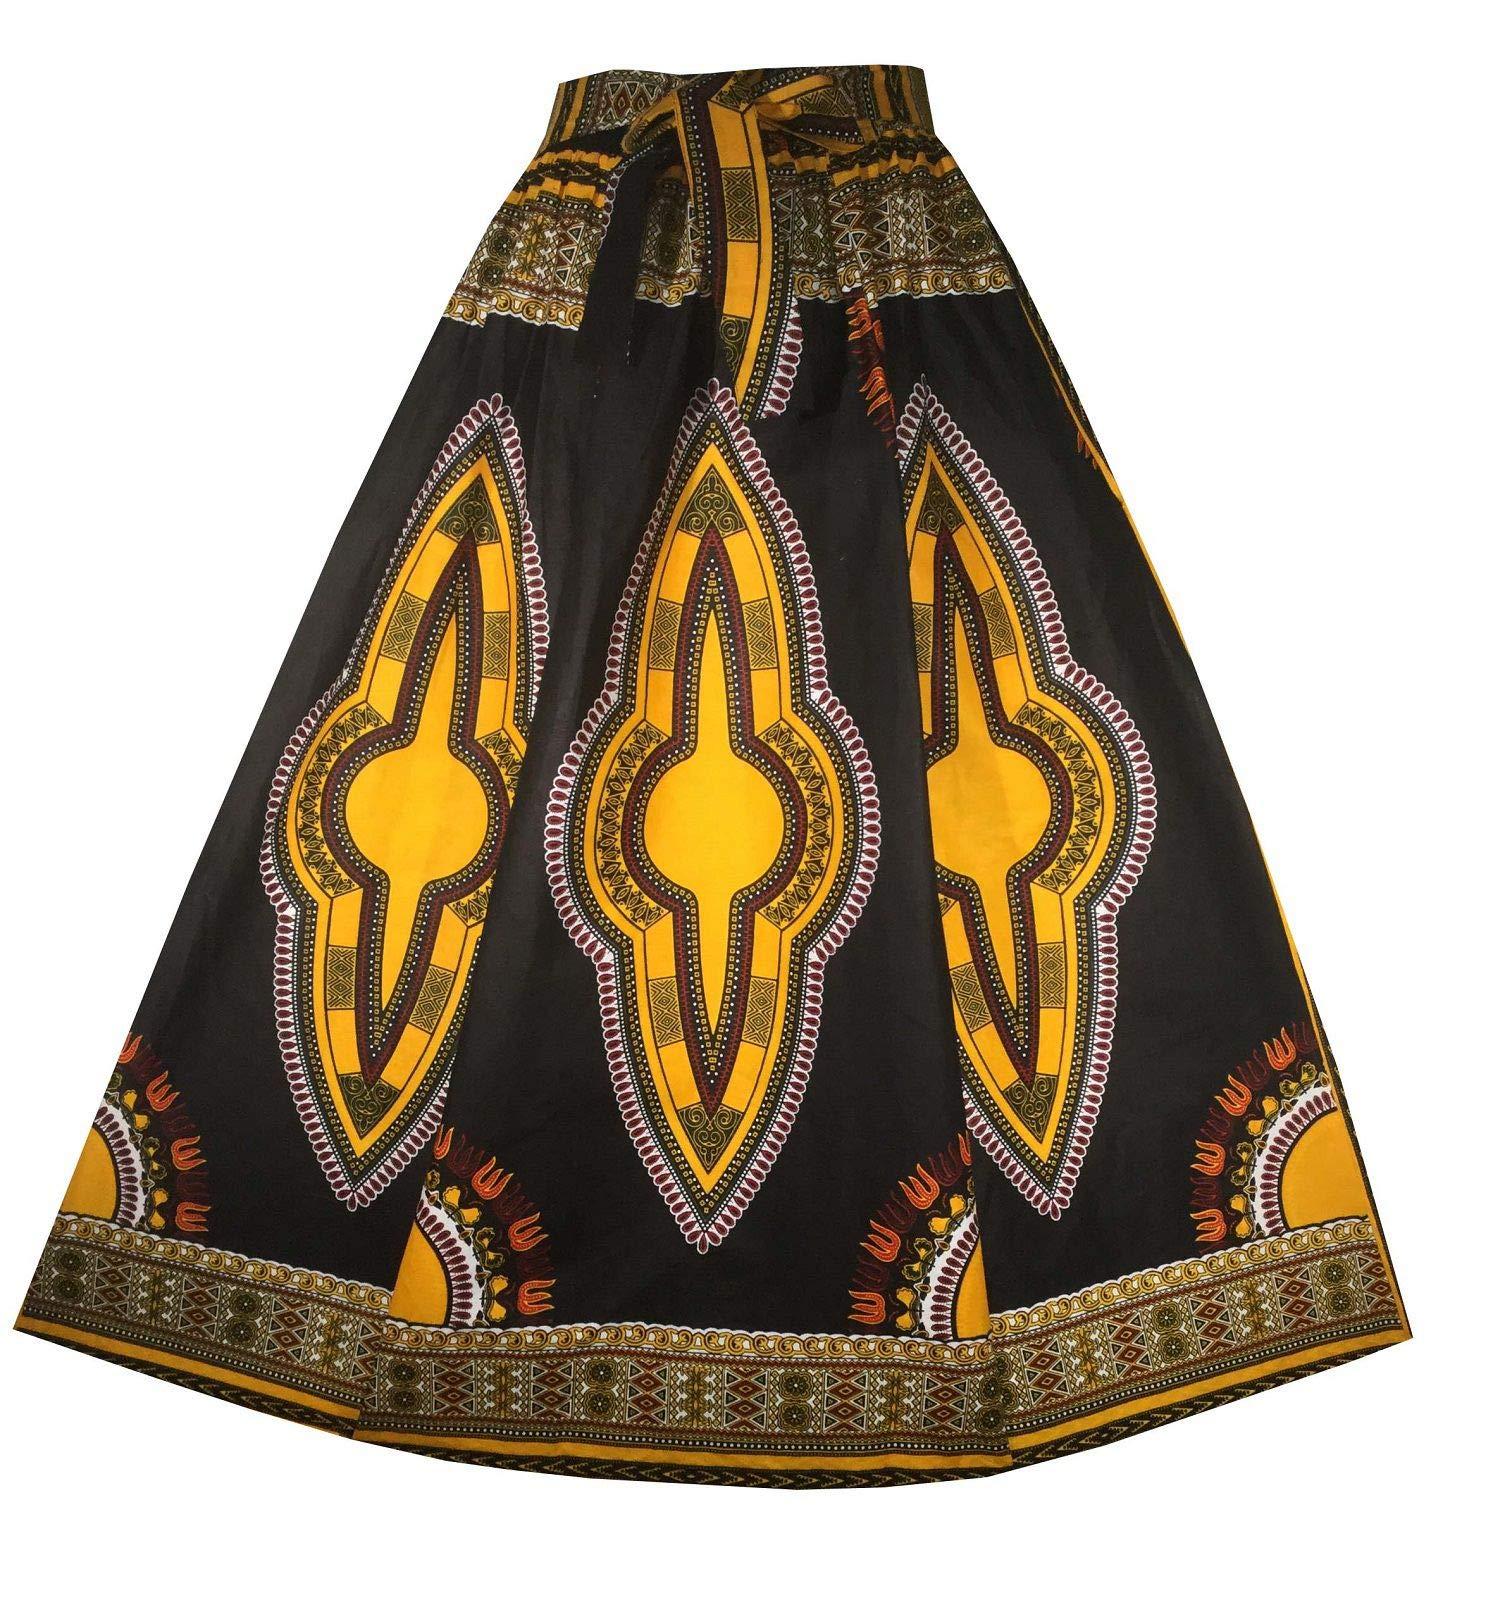 Decoraapparel Women's African Dashiki Maxi Skirt Long High Waist Skirt One Size (Black Light Yellow Thick Fabric 126'' Sweep 42'' Long)